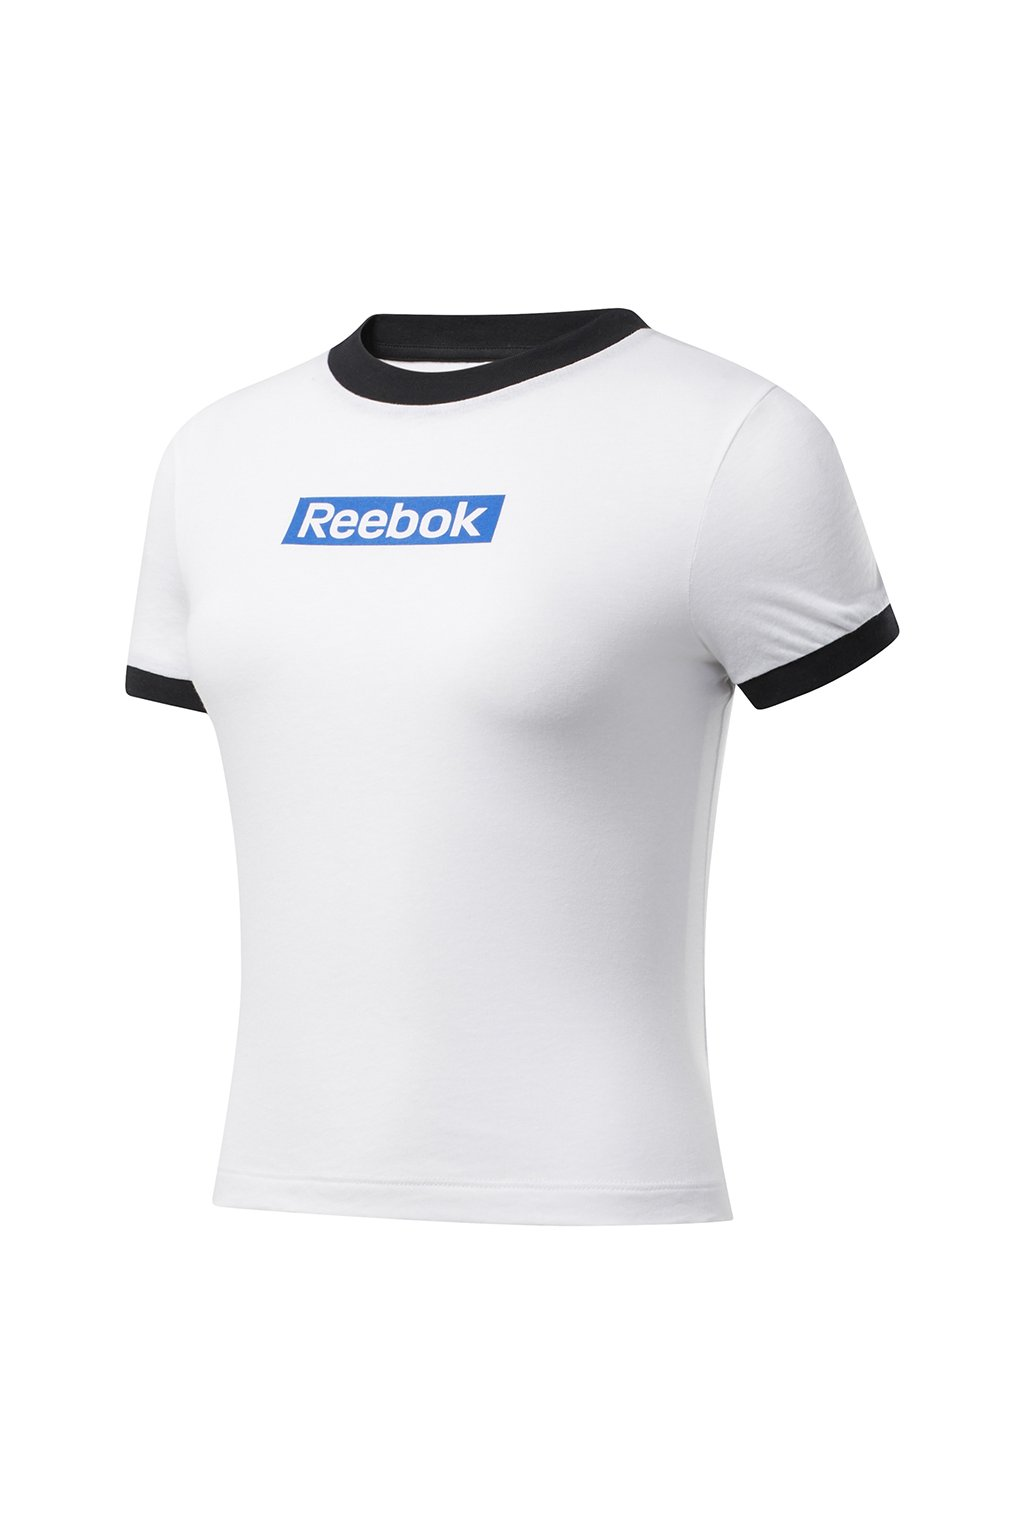 Dámske tričko Reebok Training Essentials Linear Logo Tee bielo-čierne FK6680